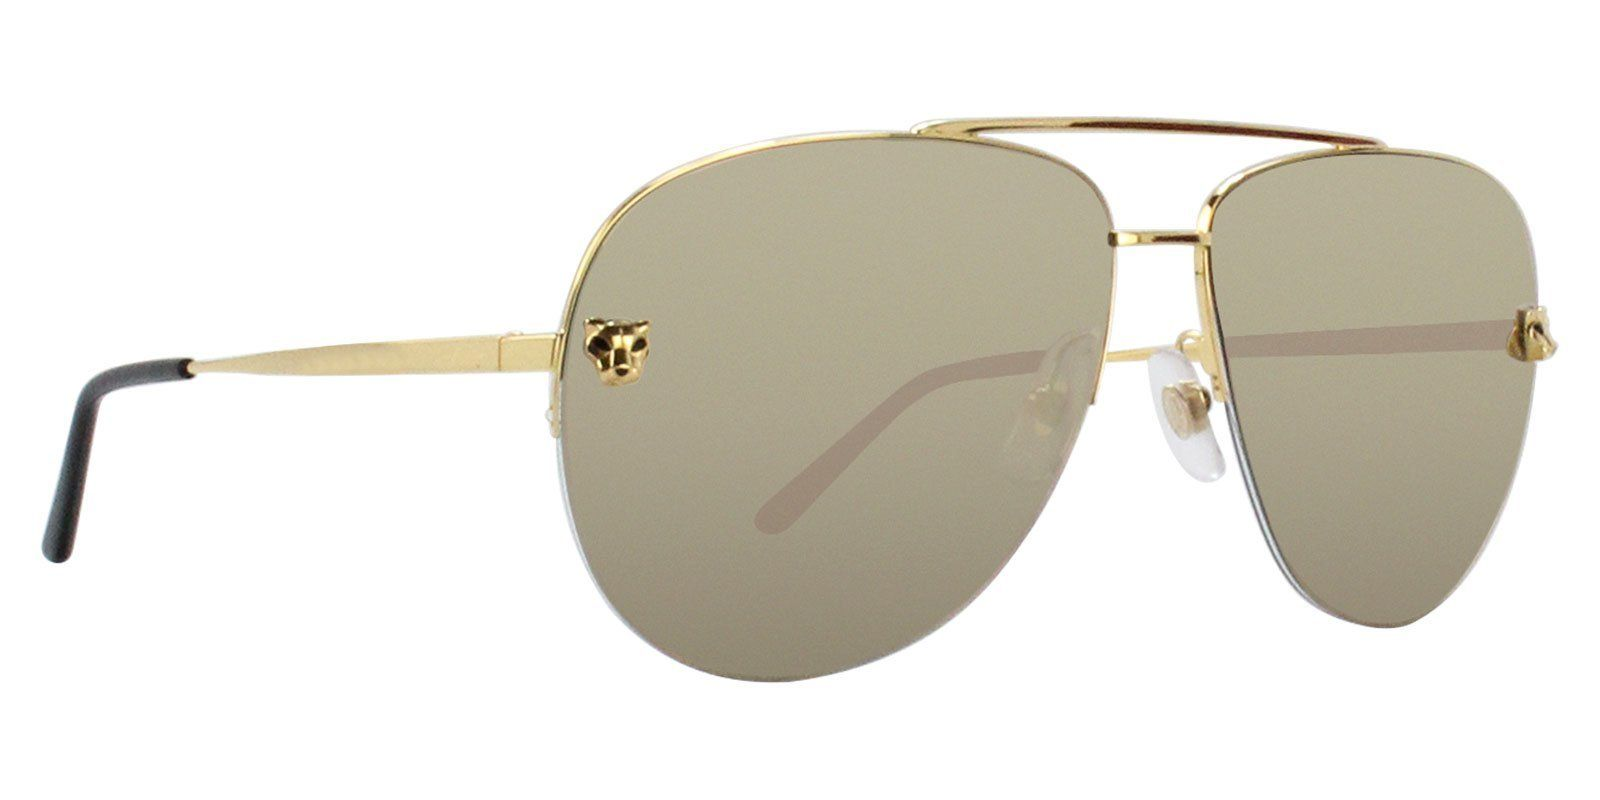 edb0a4656cb0 Cartier - Panthere Aviator ESW00094 sunglasses